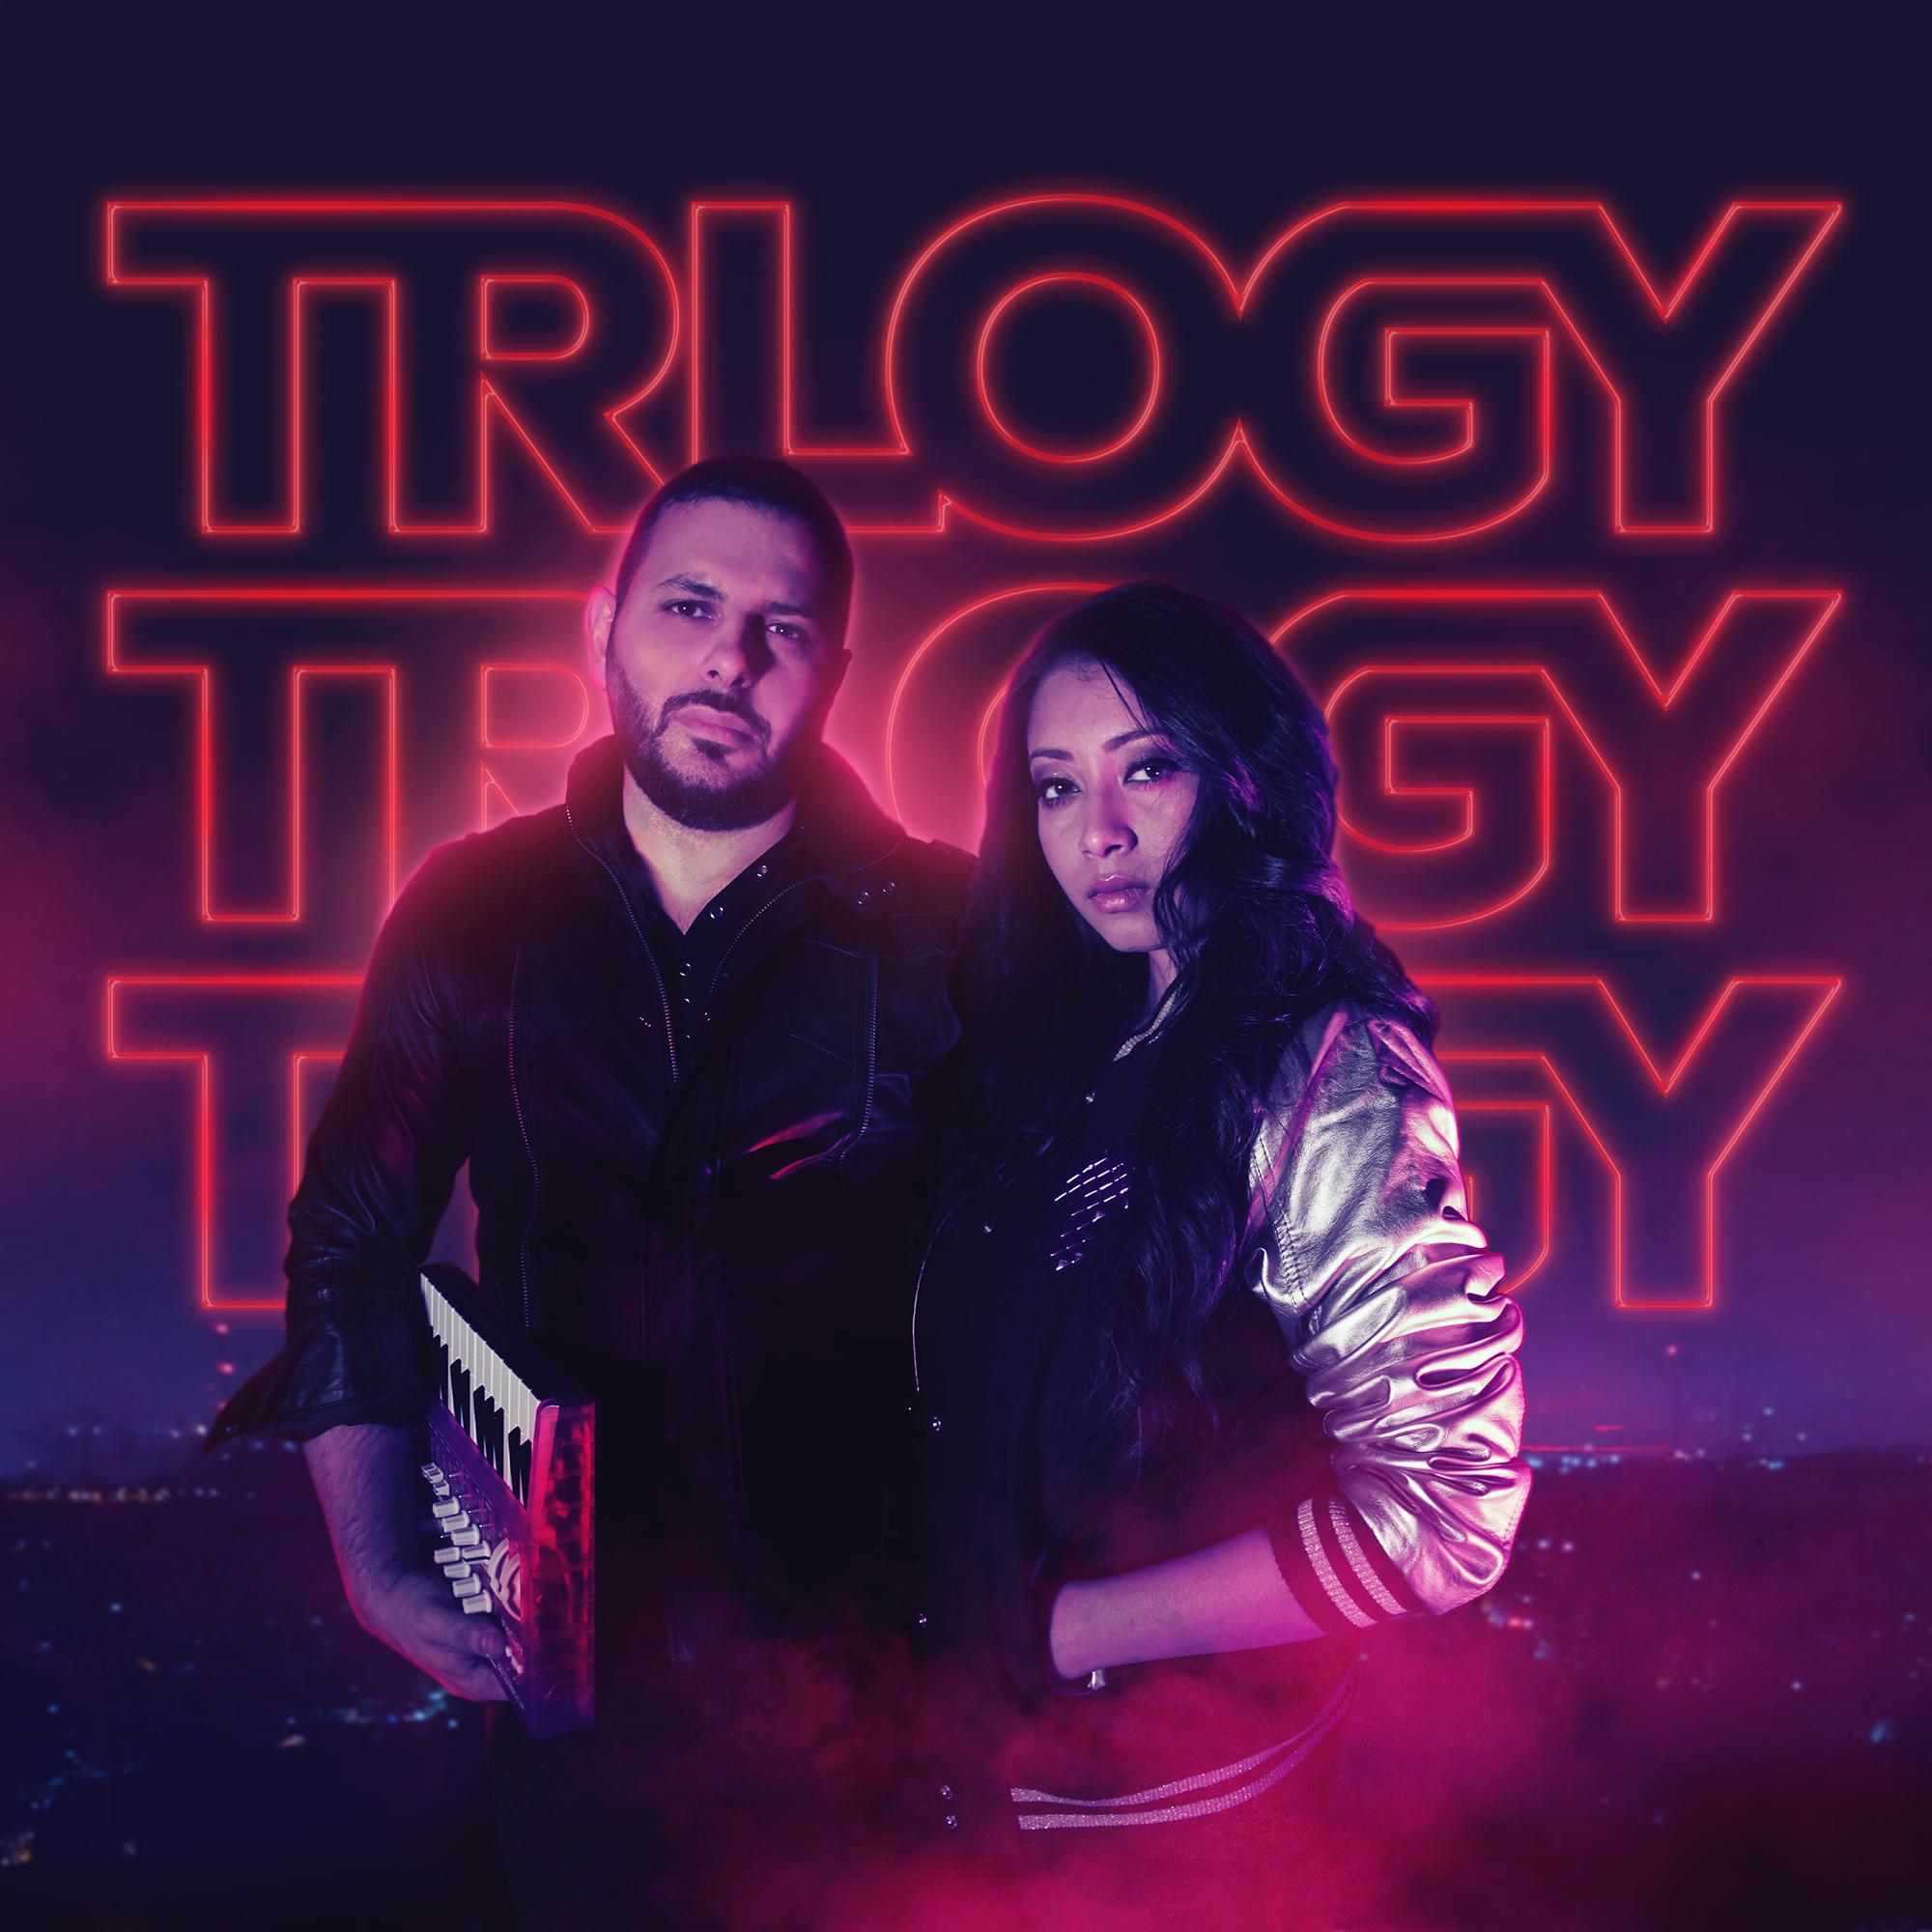 Trlogy - PromoPic 2.jpg